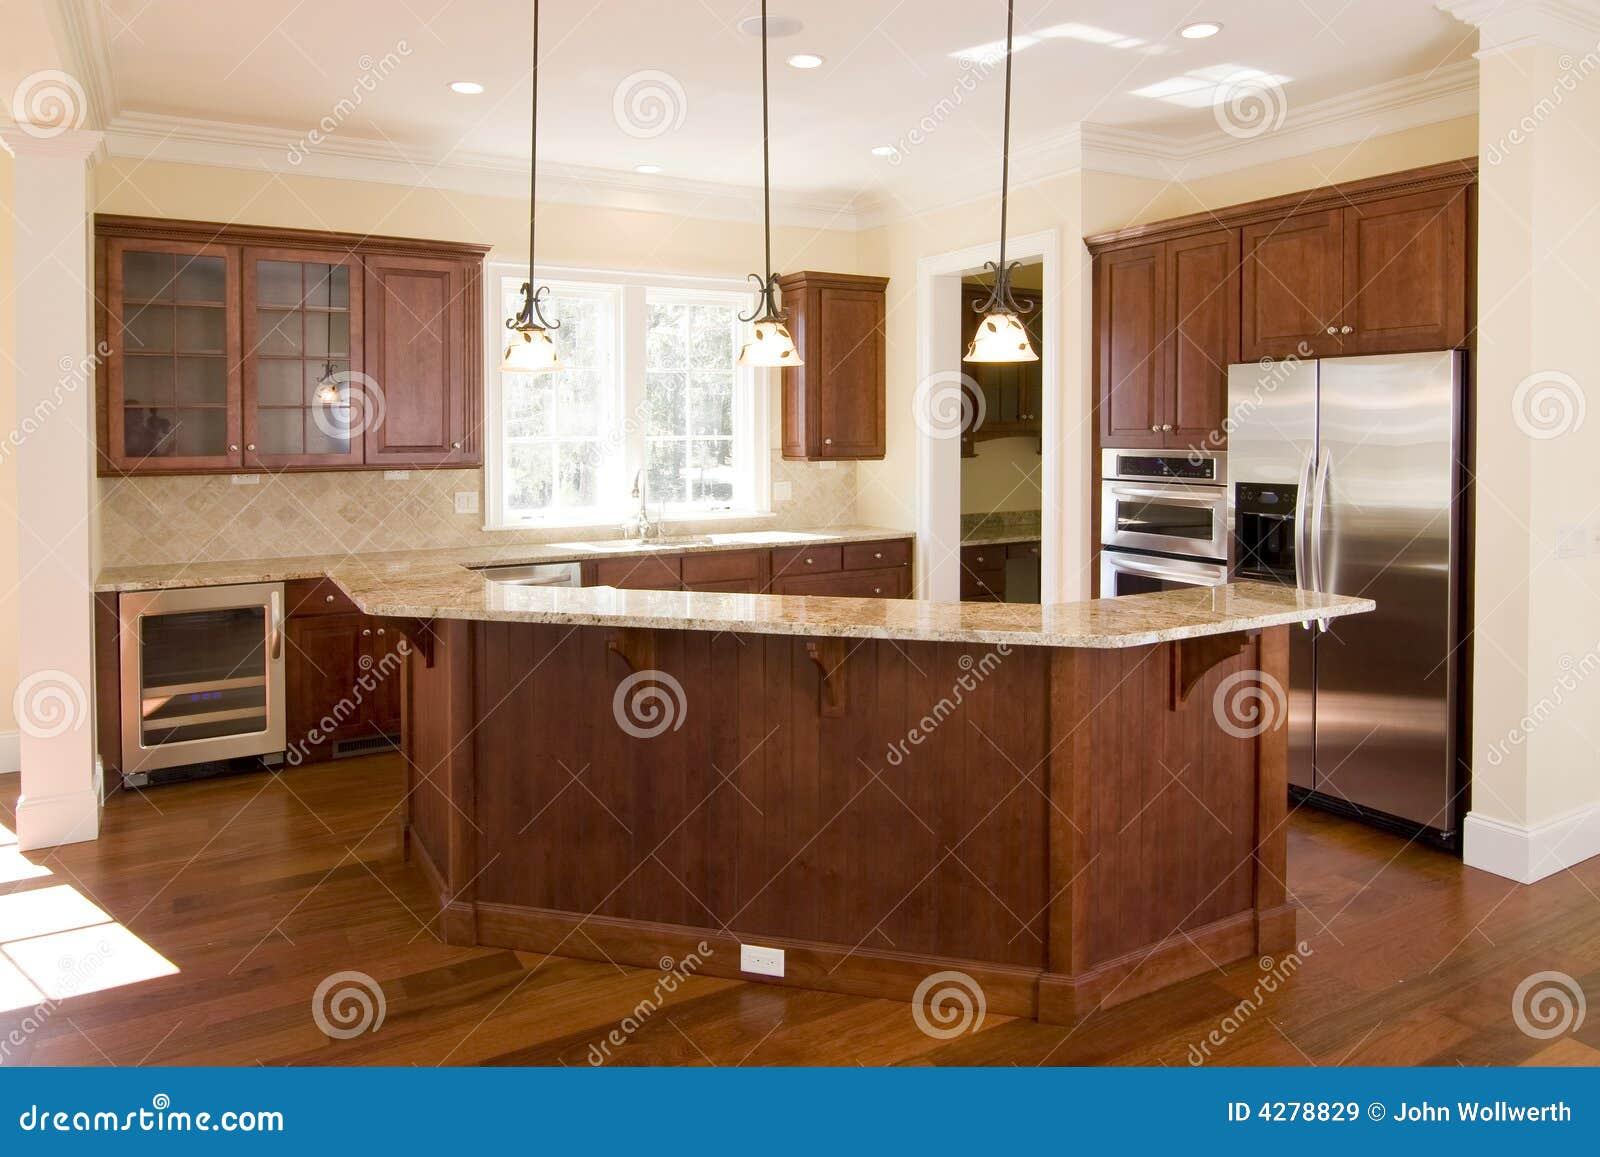 Cucina opulenta in legno scuro immagine stock immagine for Cucine in stock